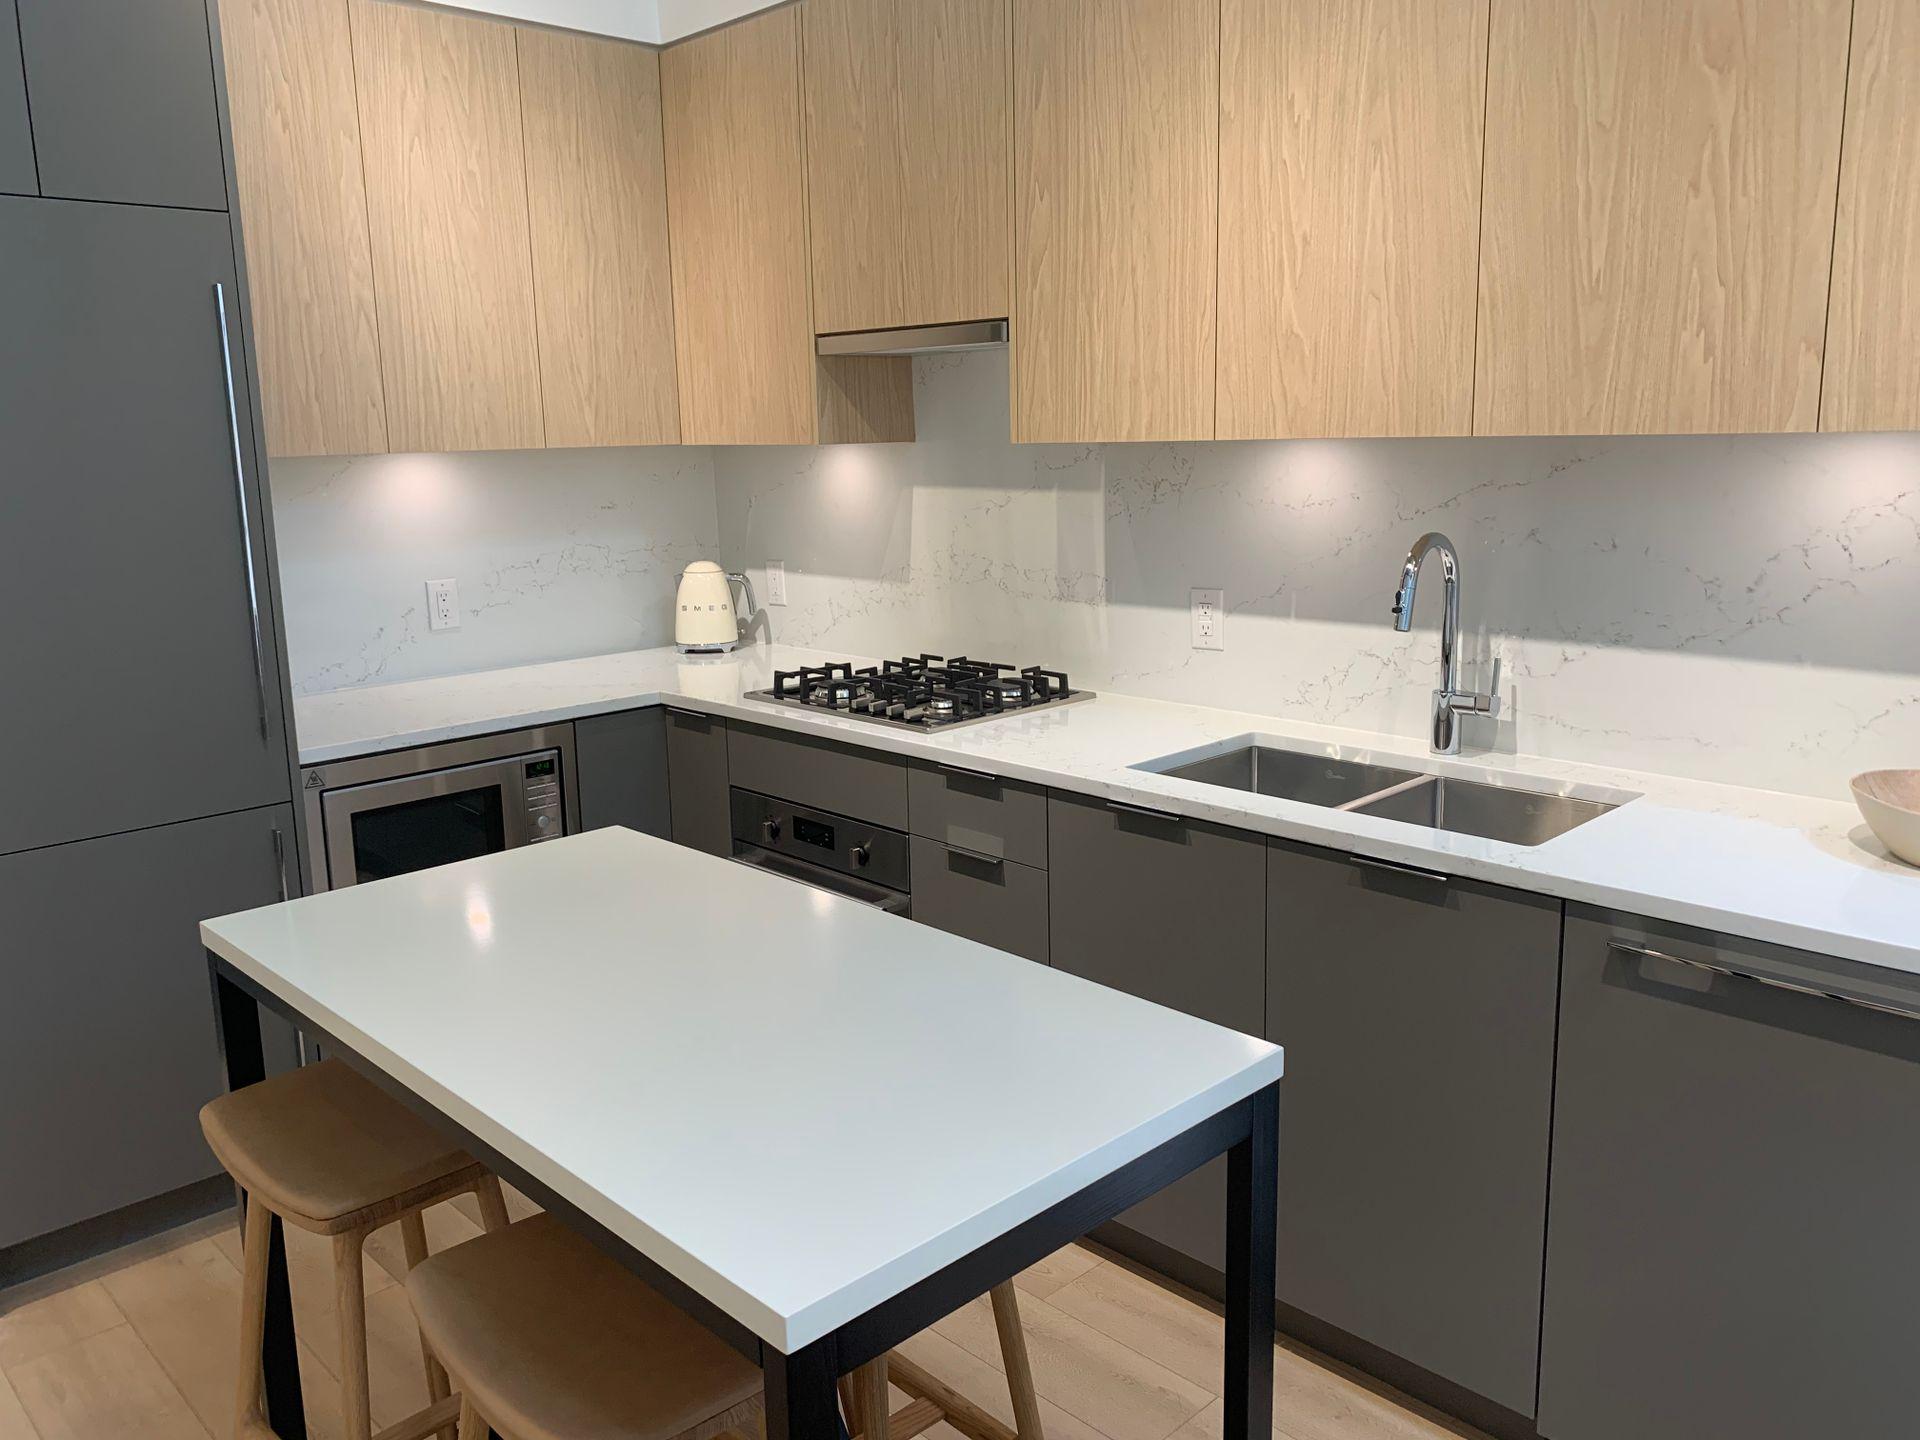 vue kitchen in oak scheme at Vue (638 Whiting Way, Coquitlam West, Coquitlam)